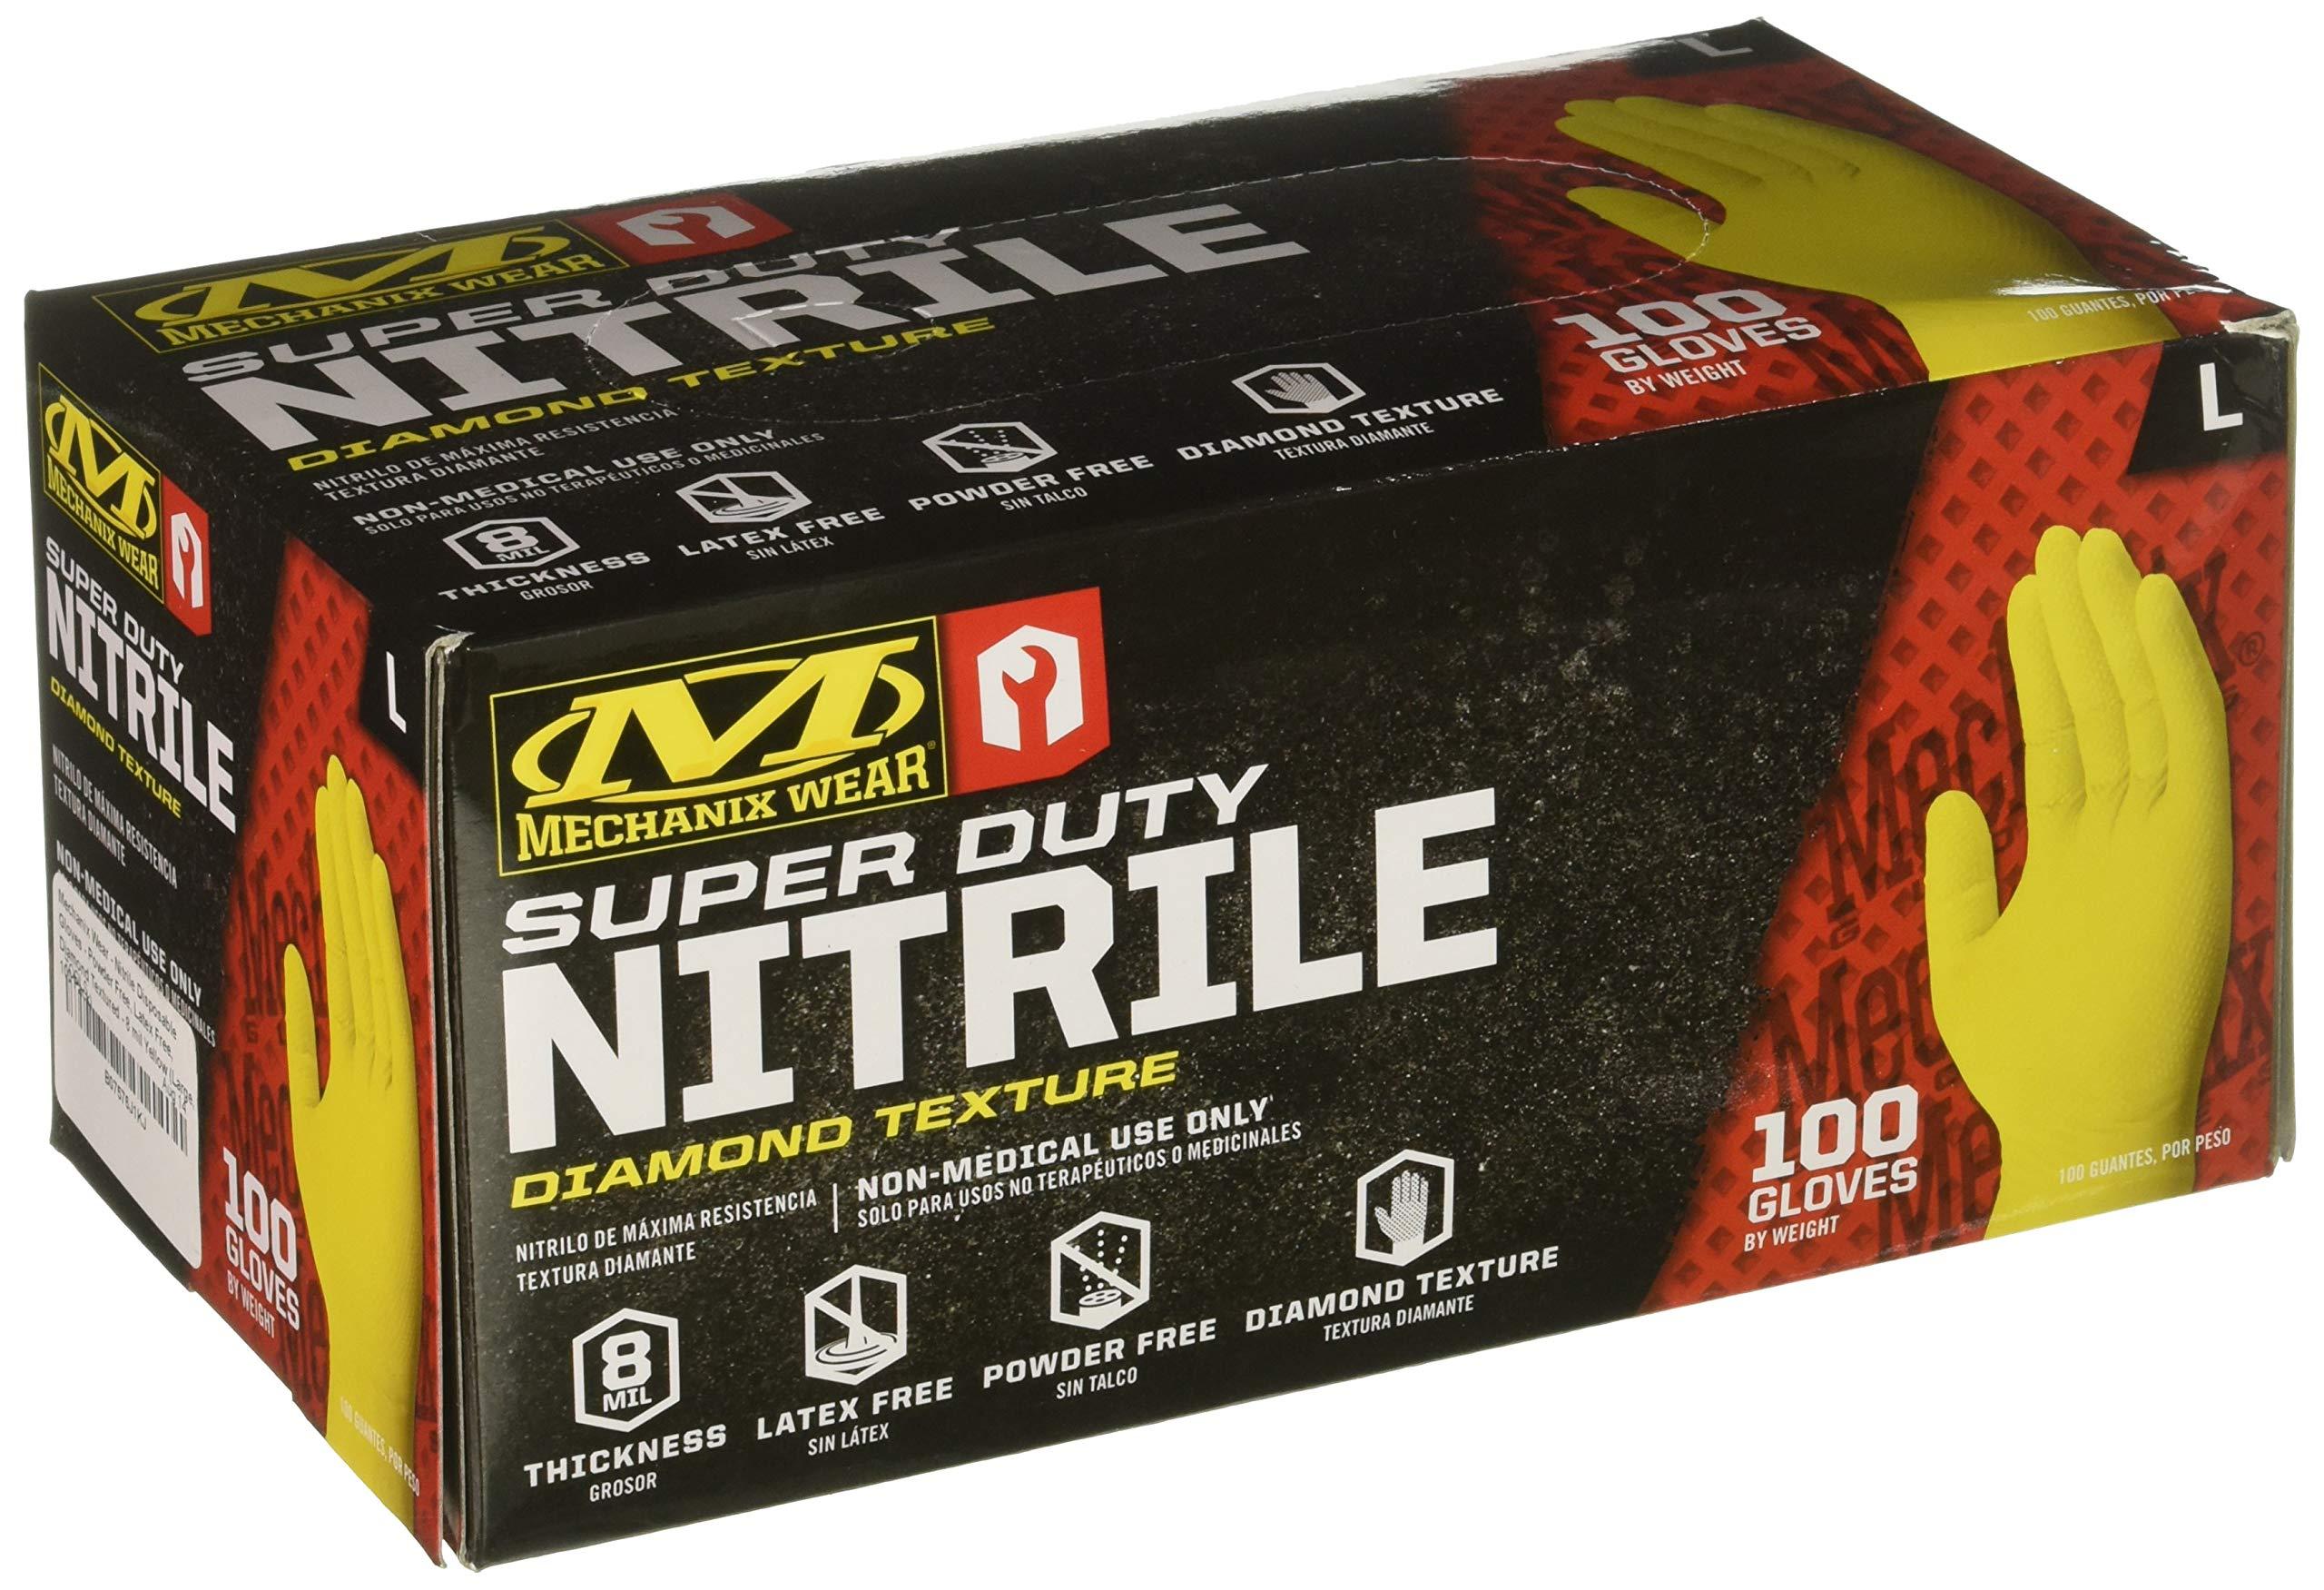 Mechanix Wear - Nitrile Disposable Gloves - Powder Free, Latex Free, Diamond Textured - 8 mil Yellow (Large, 100 Pack) by Mechanix Wear (Image #2)